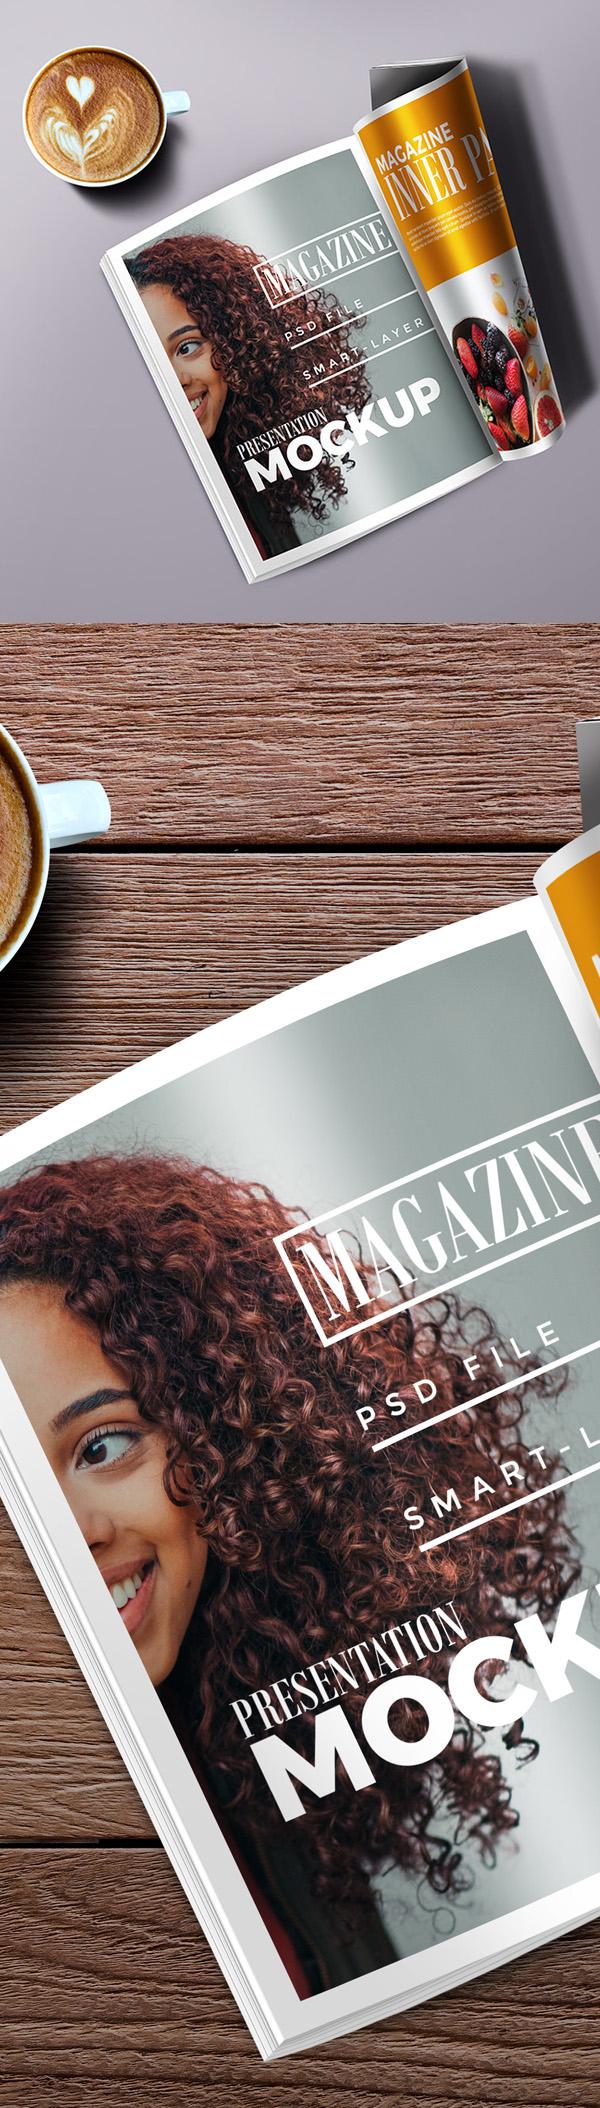 Libre de alta resolución de la revista maqueta PSD